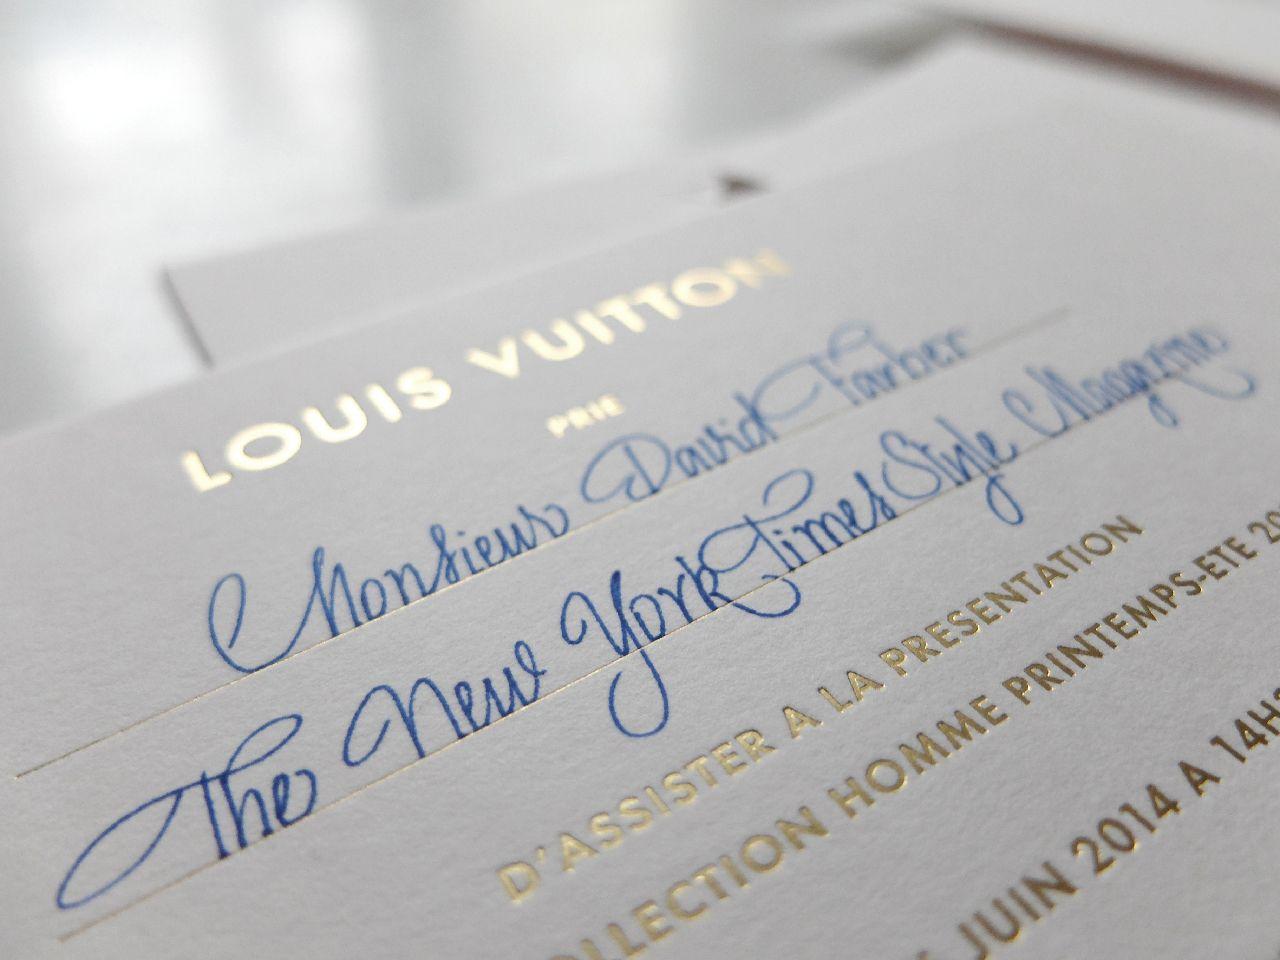 Sandie Le Chaix Calligraphie Invitation Louis Vuitton Defile 2015 12 Jpg Invitation Mariage Calligraphie